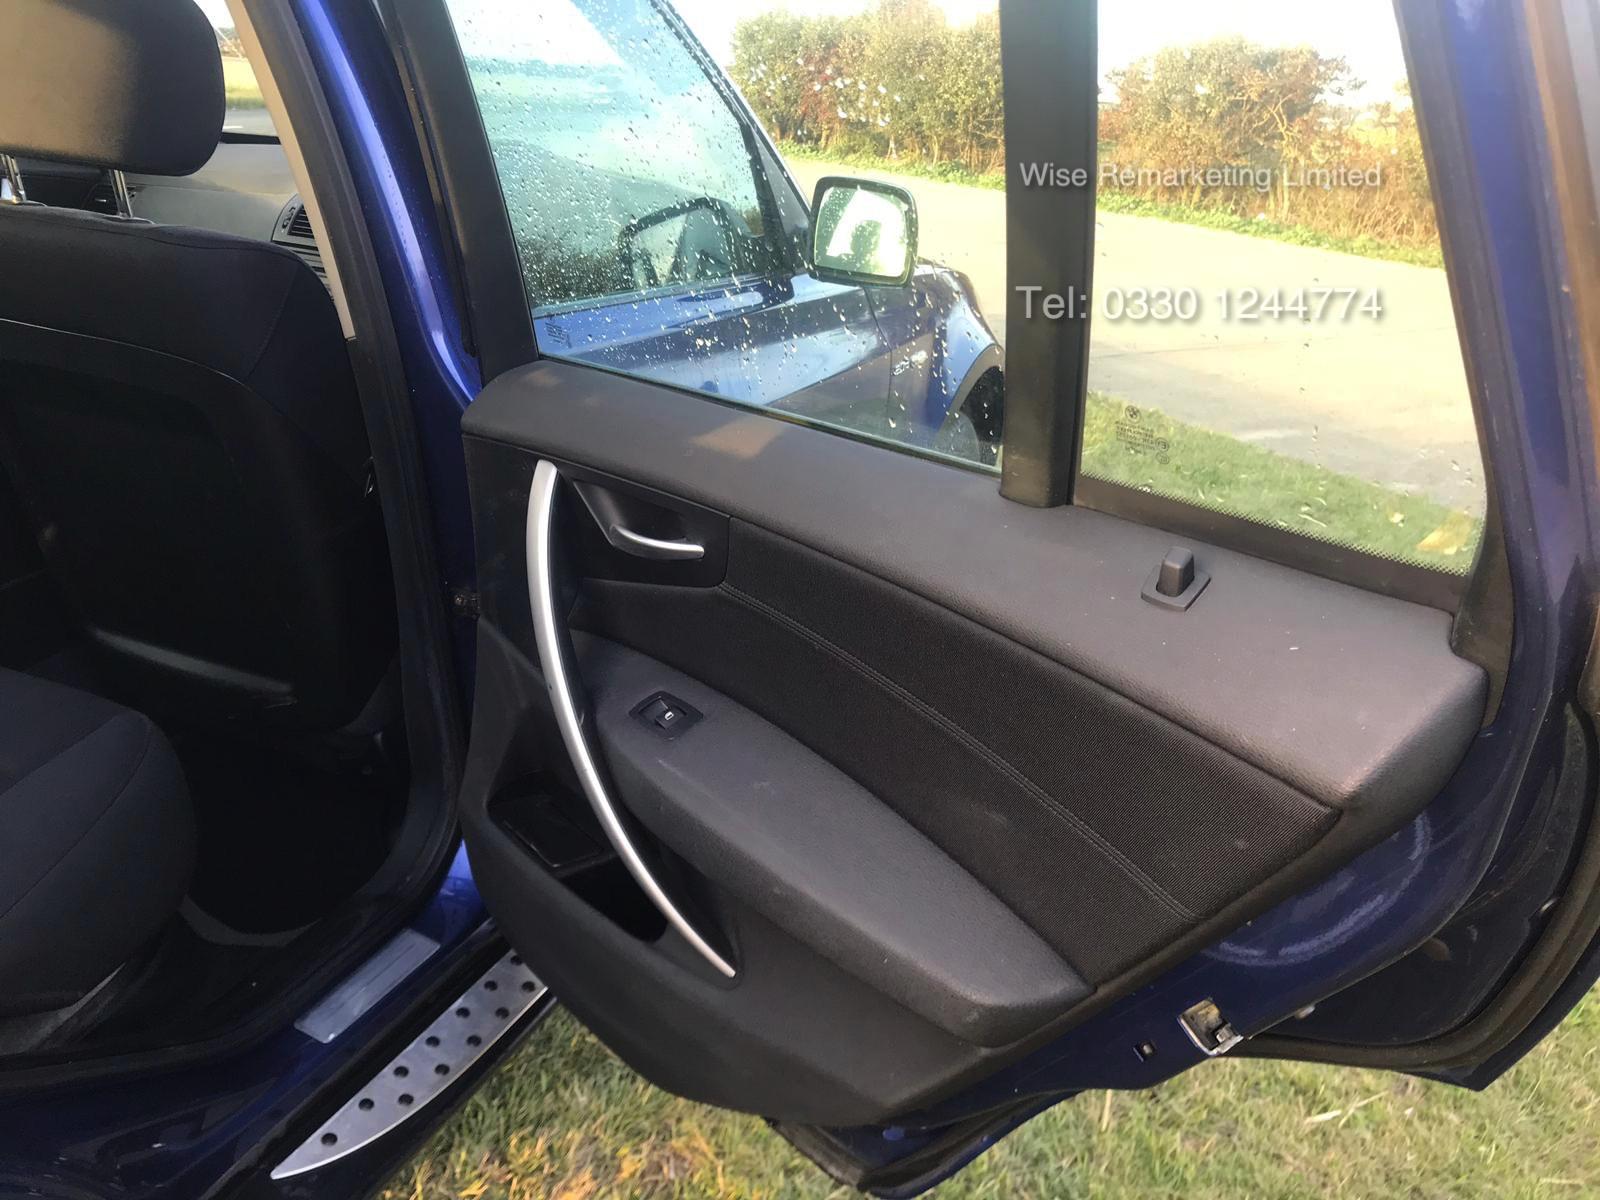 Lot 45 - BMW X3 2.0d Special Equipment - 2007 Model - 4x4 - Metallic Blue